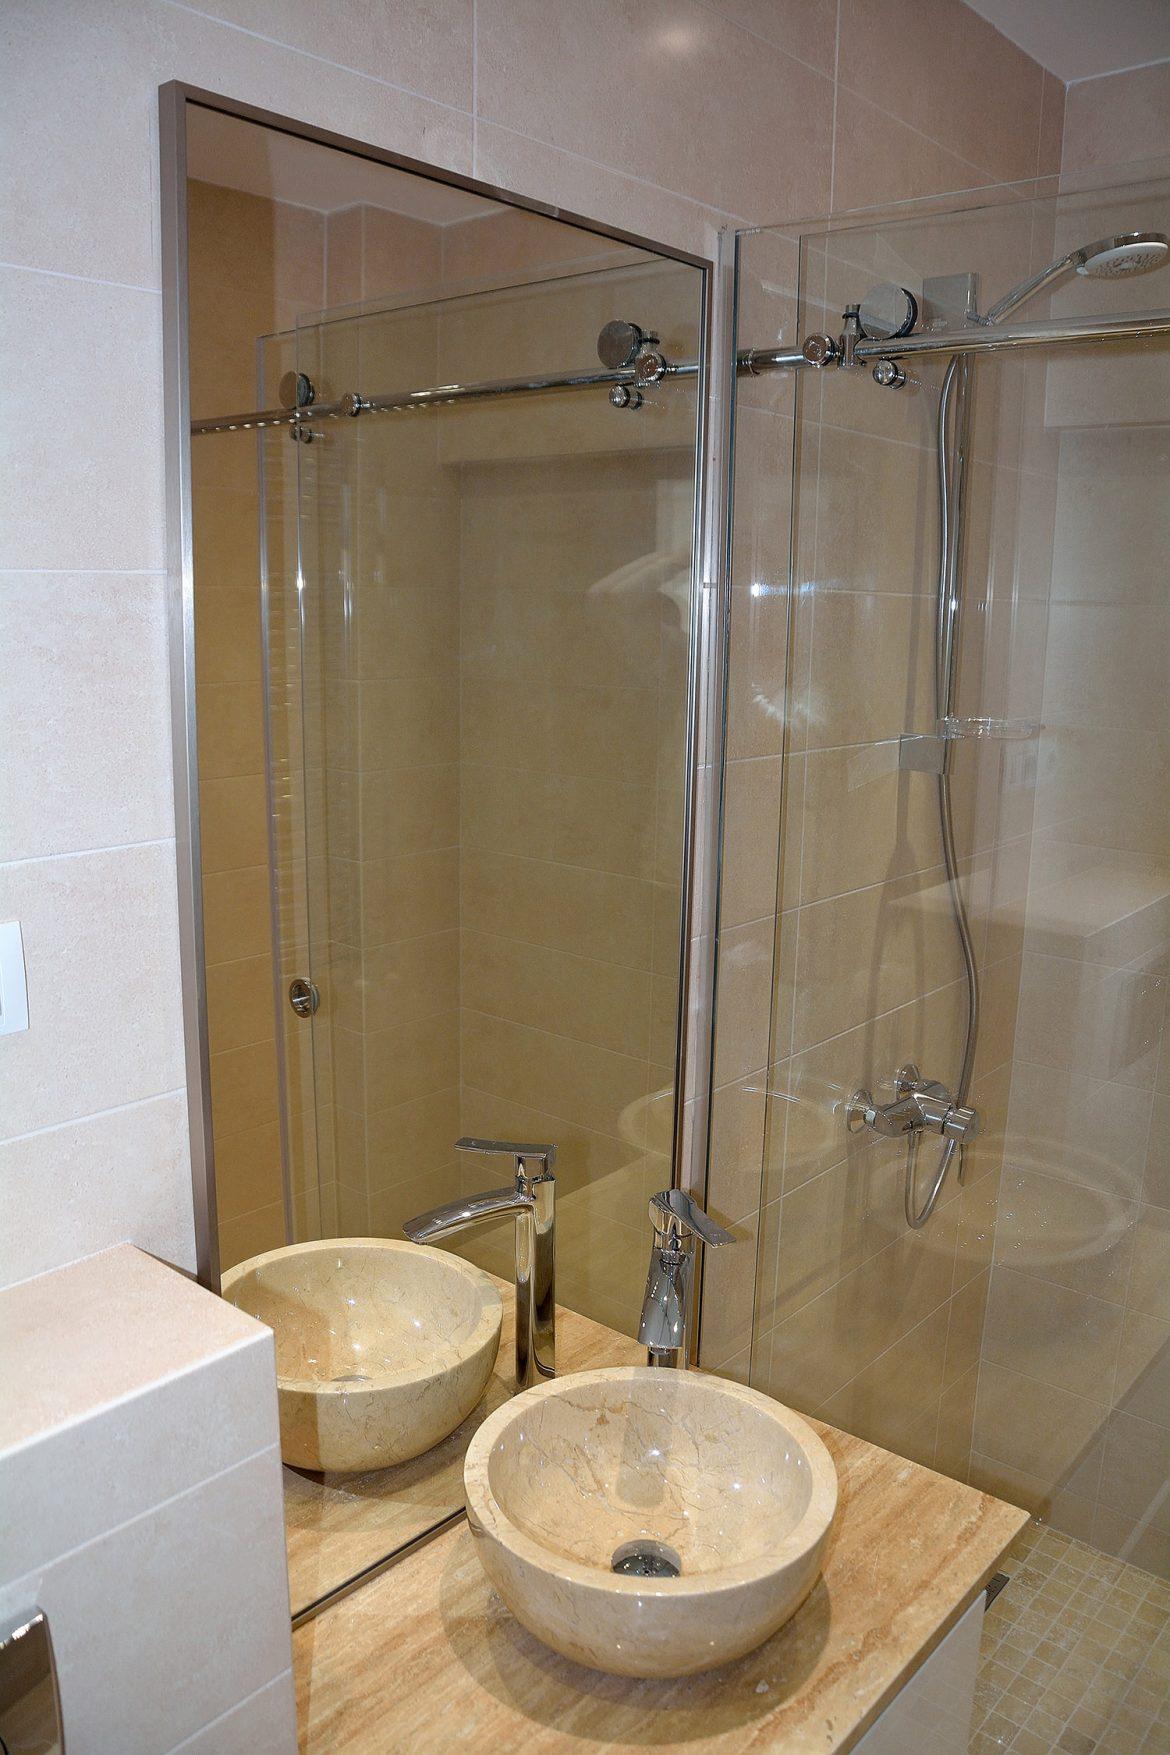 Mobilier baie realizat pe comanda in intregime din Mdf Vopsit Lucios Alb cu frezare maner usi cu inchidere cu amortizare Blum